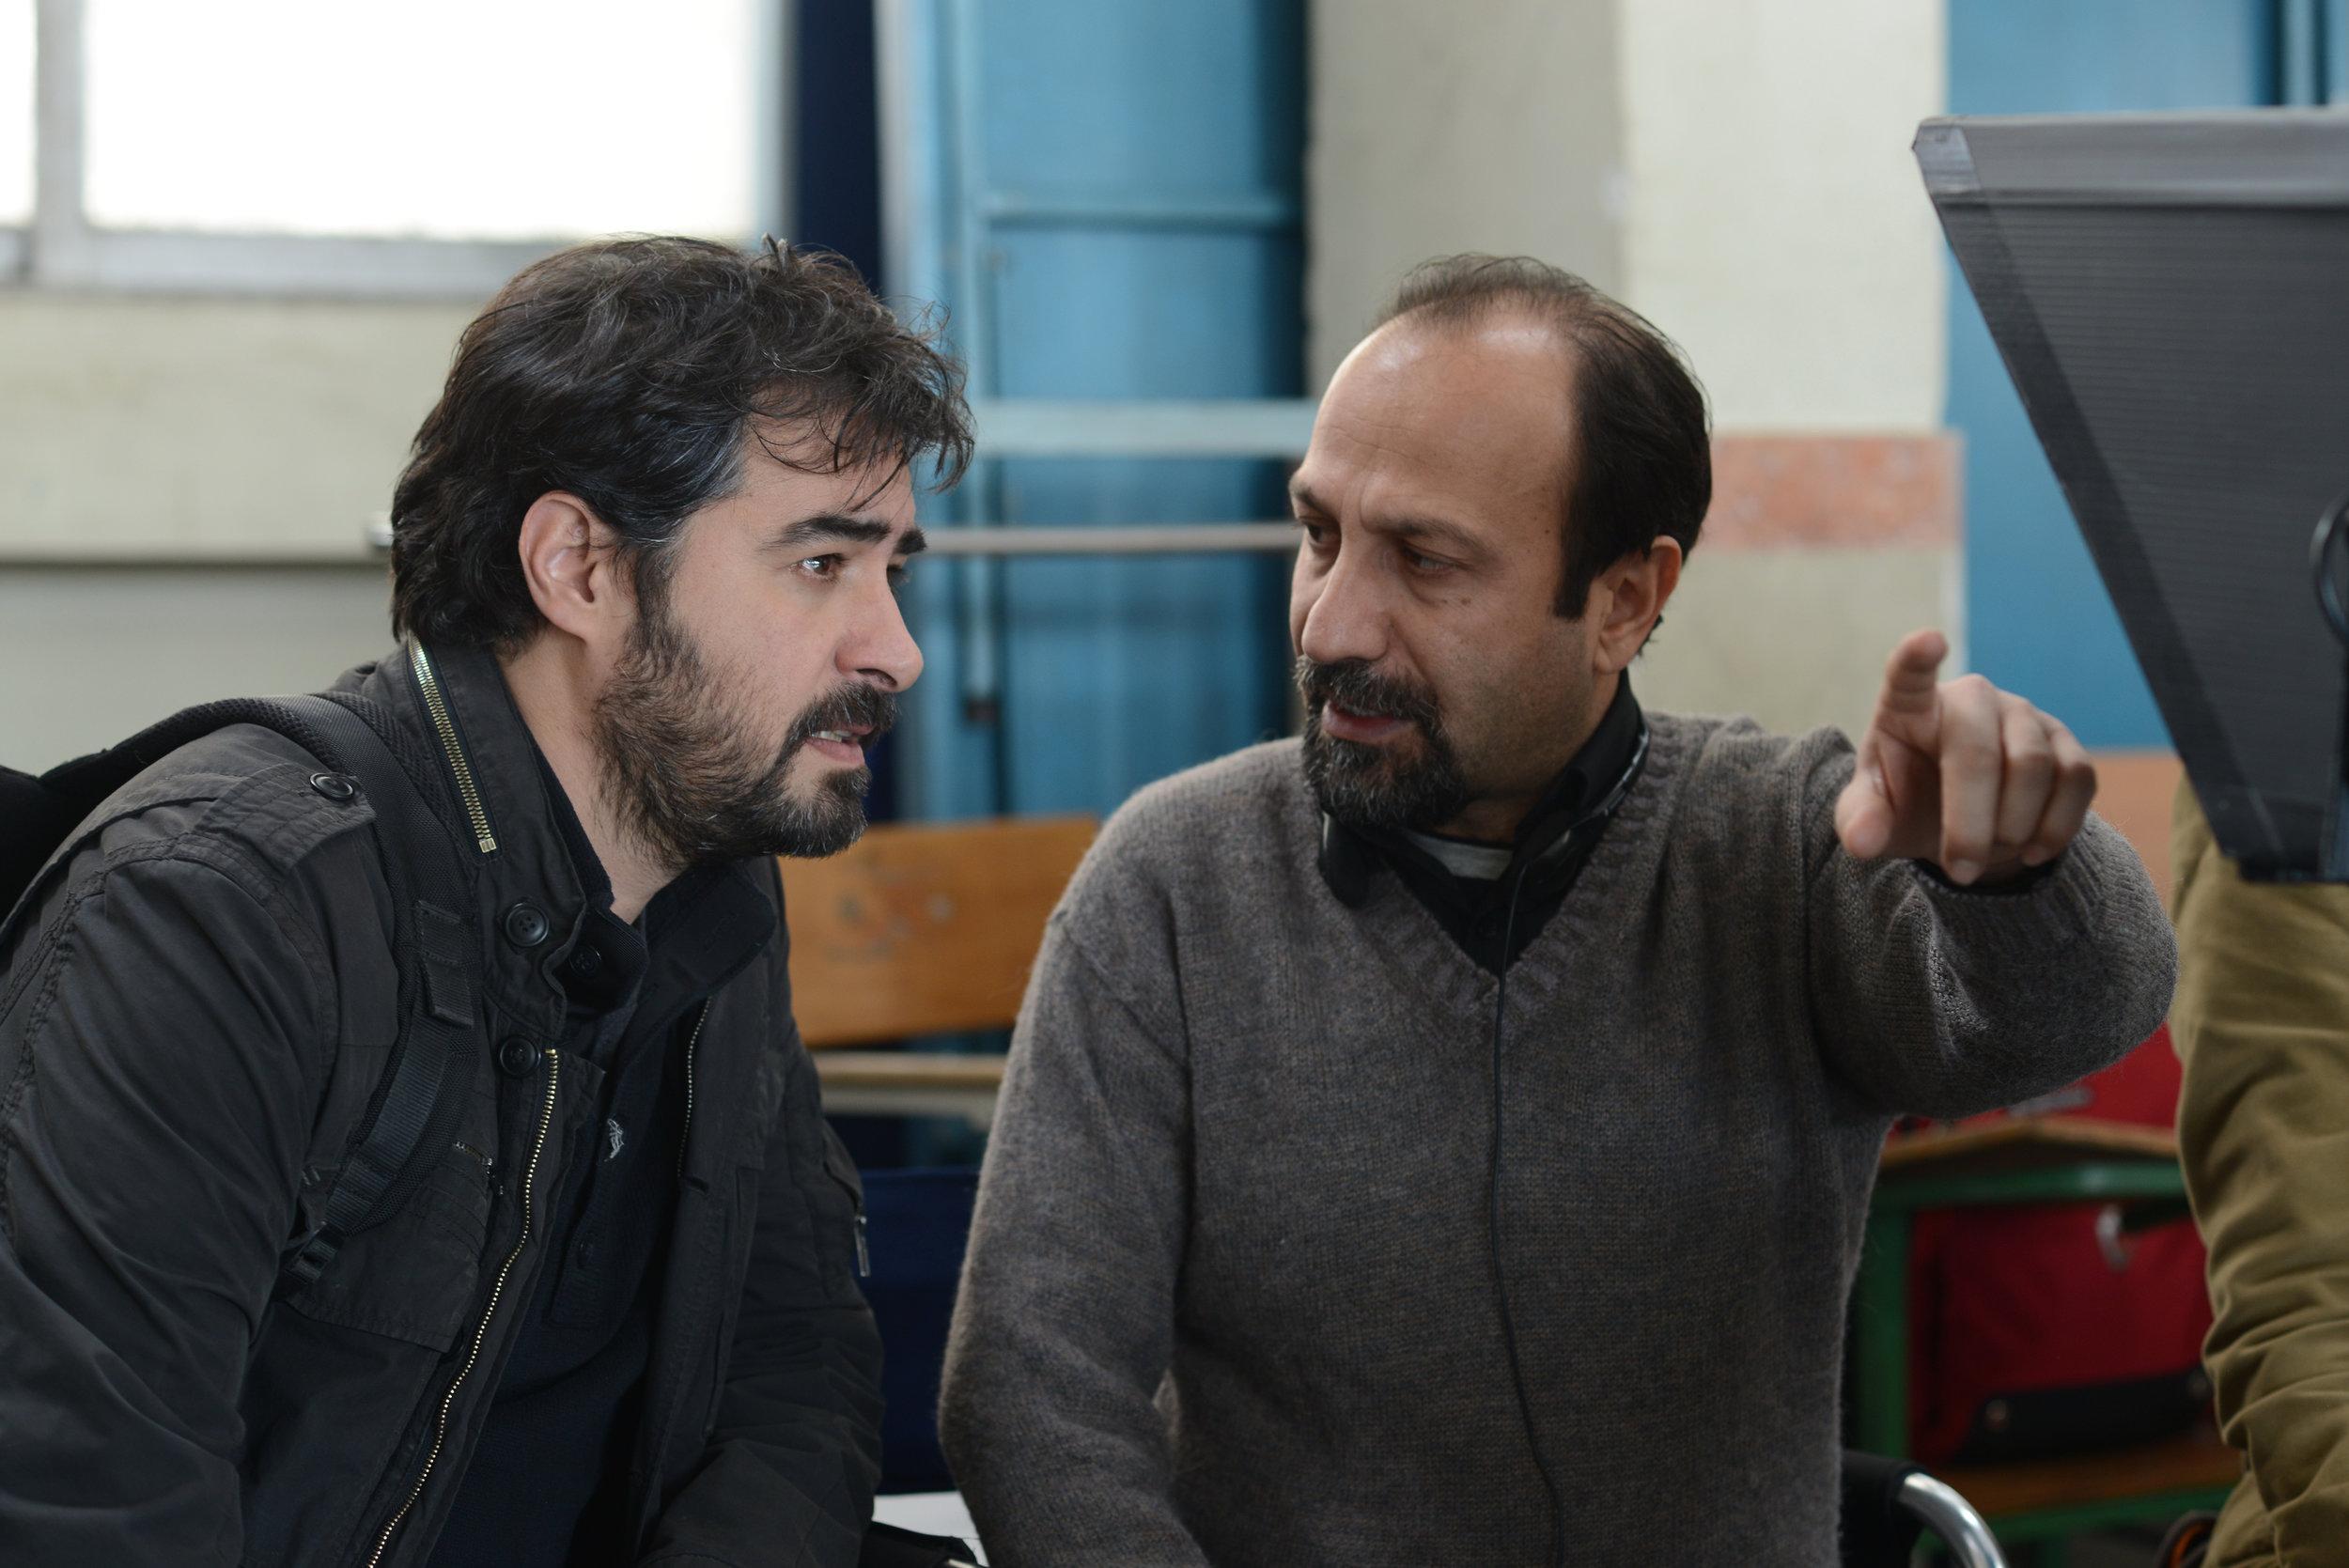 Asghar Farhadi on the set of  The Salesman with leading actor Shahab Hosseini ©Habib_Majidi